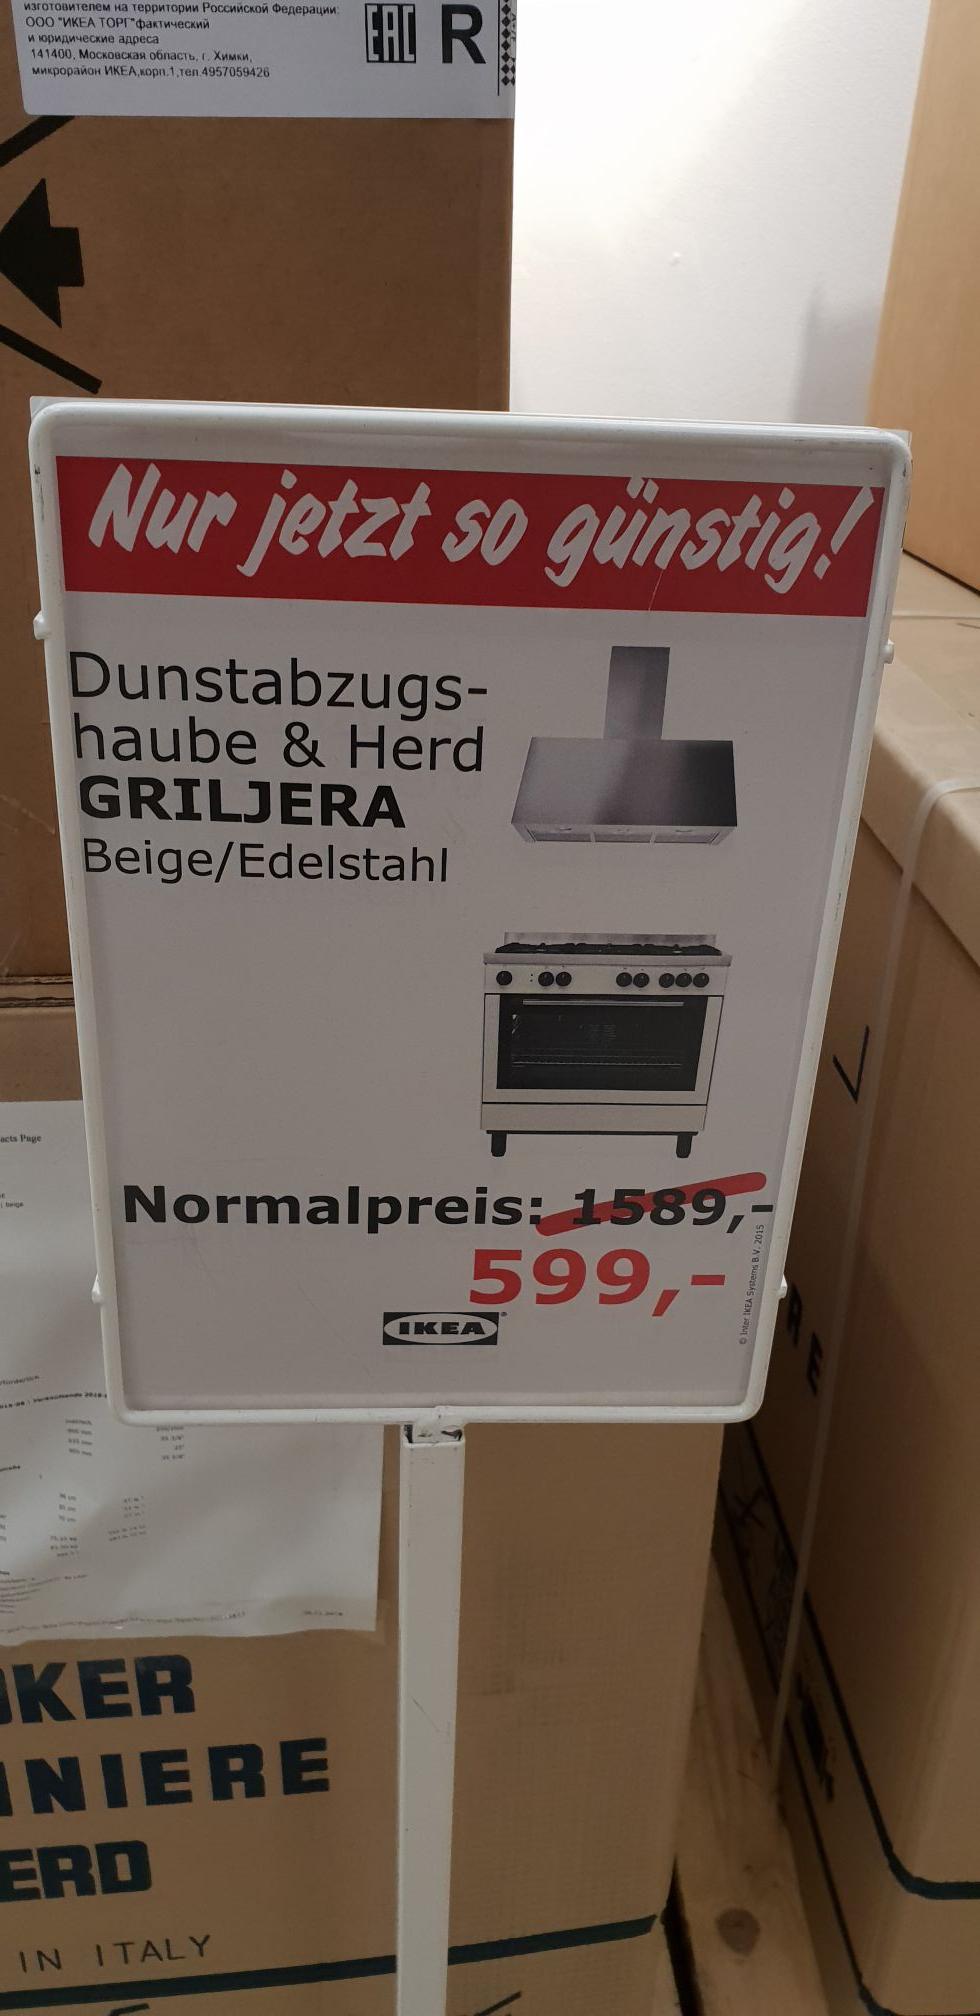 Lokal IKEA Köln Butzweilerhof Griljera Dunstabzugshaube und Herd